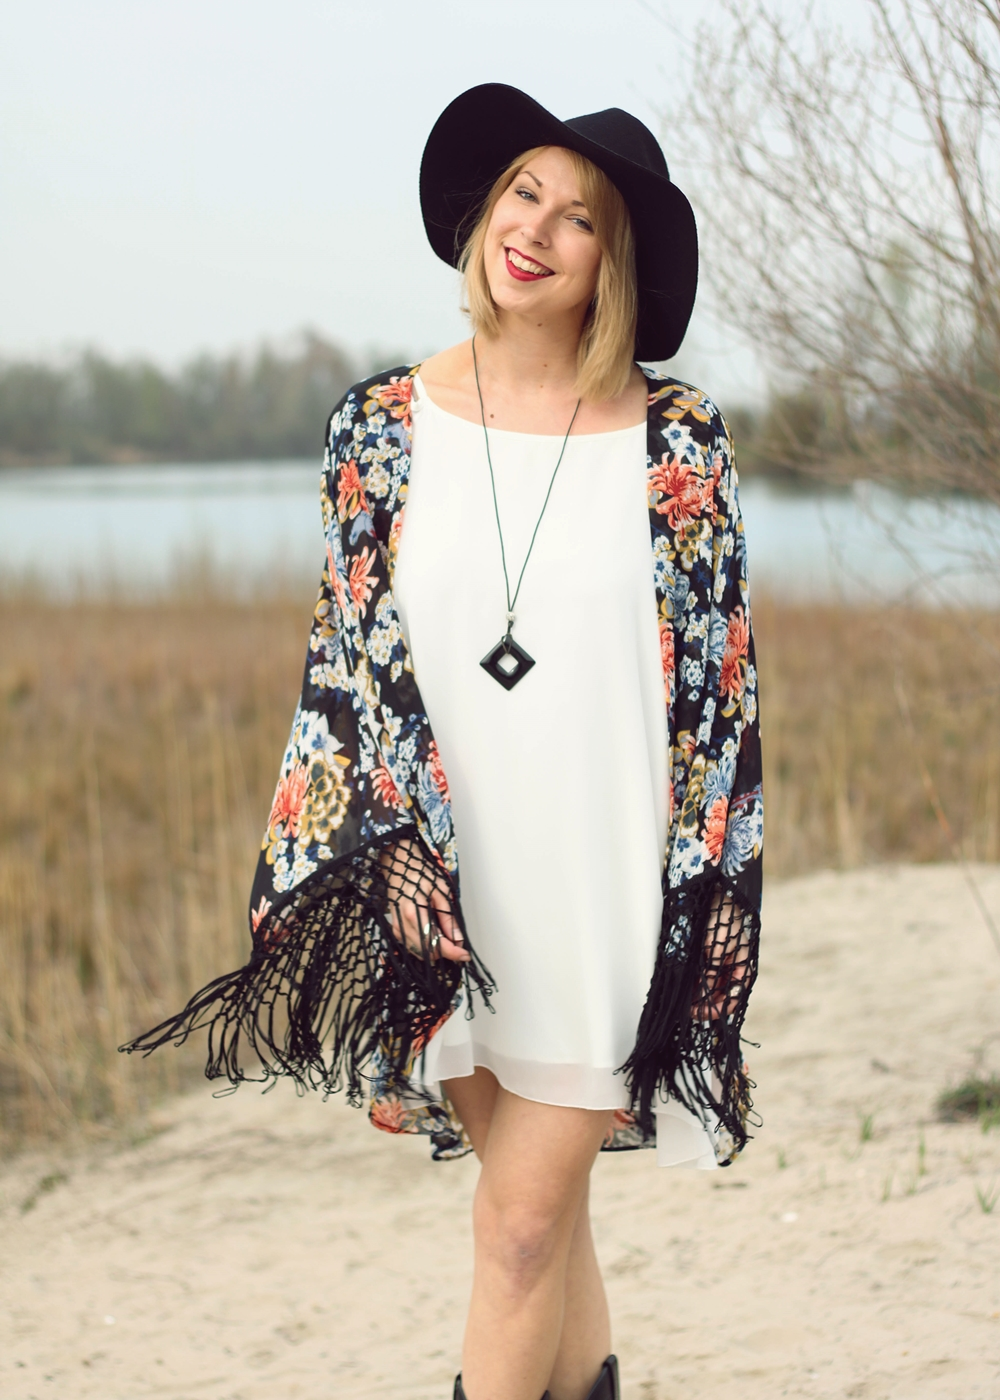 innovative design fadfb f2435 Fashionblogger Outfit Kimono weisses Kleid Cowboystiefel ...